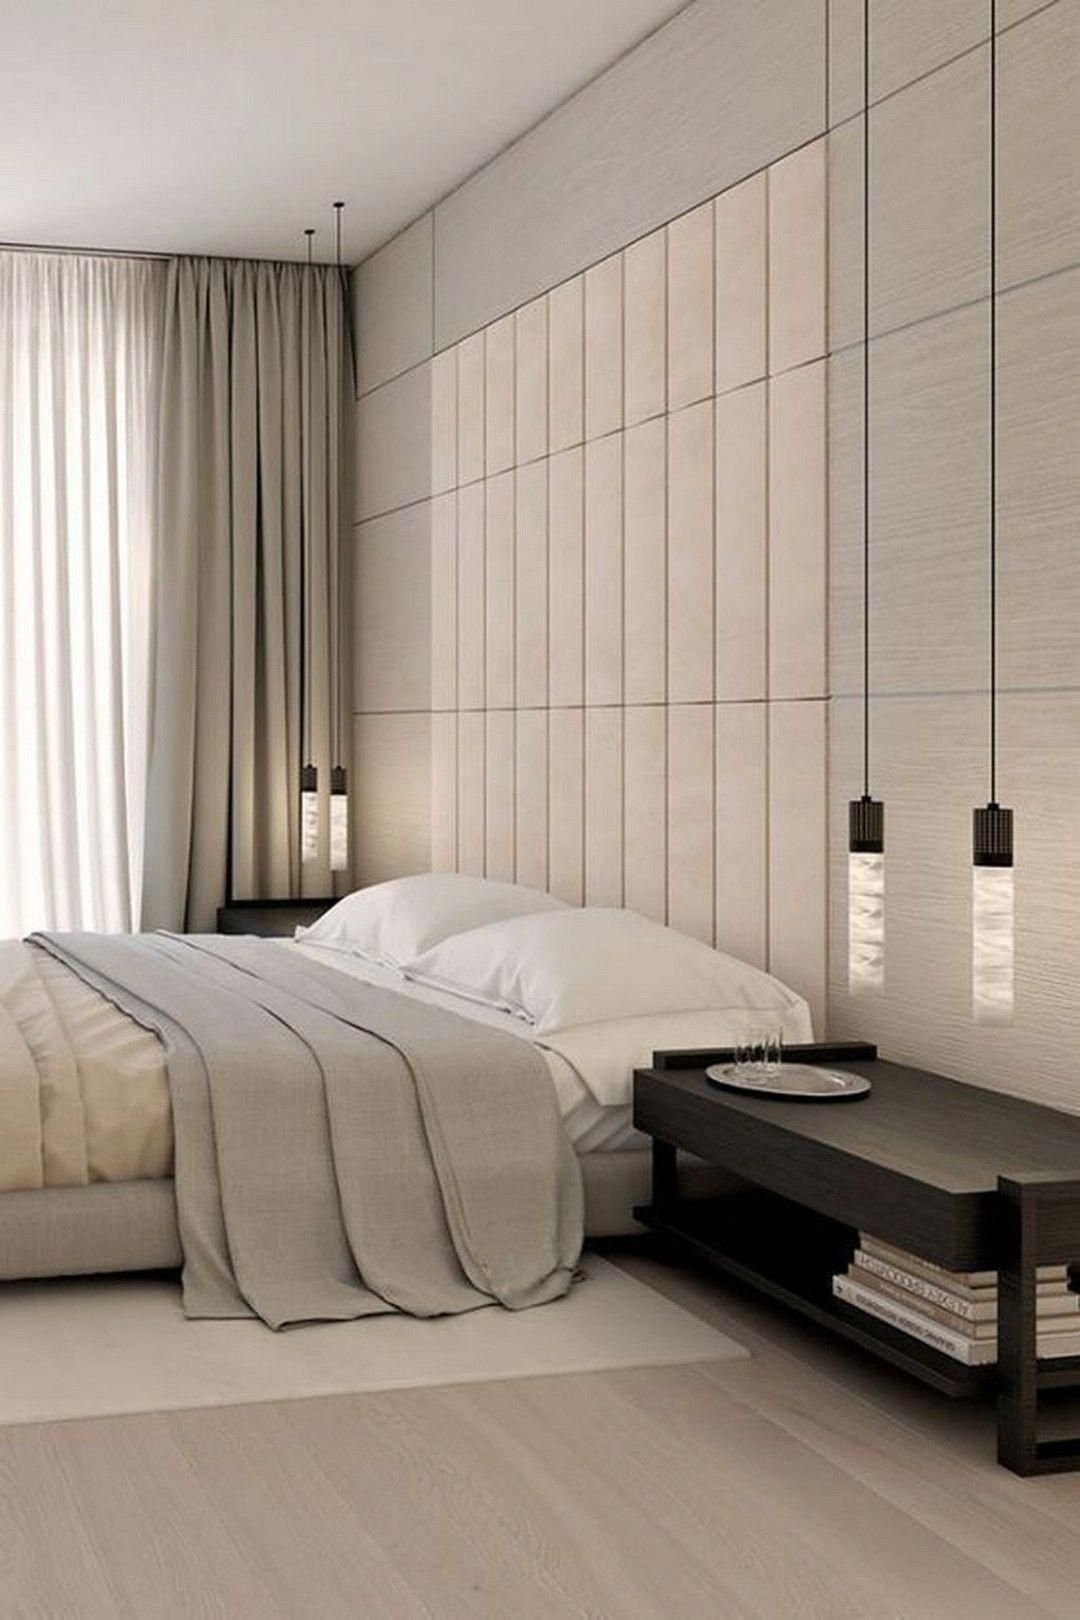 ModernHomeDecorInteriorDesign Modern master bedroom